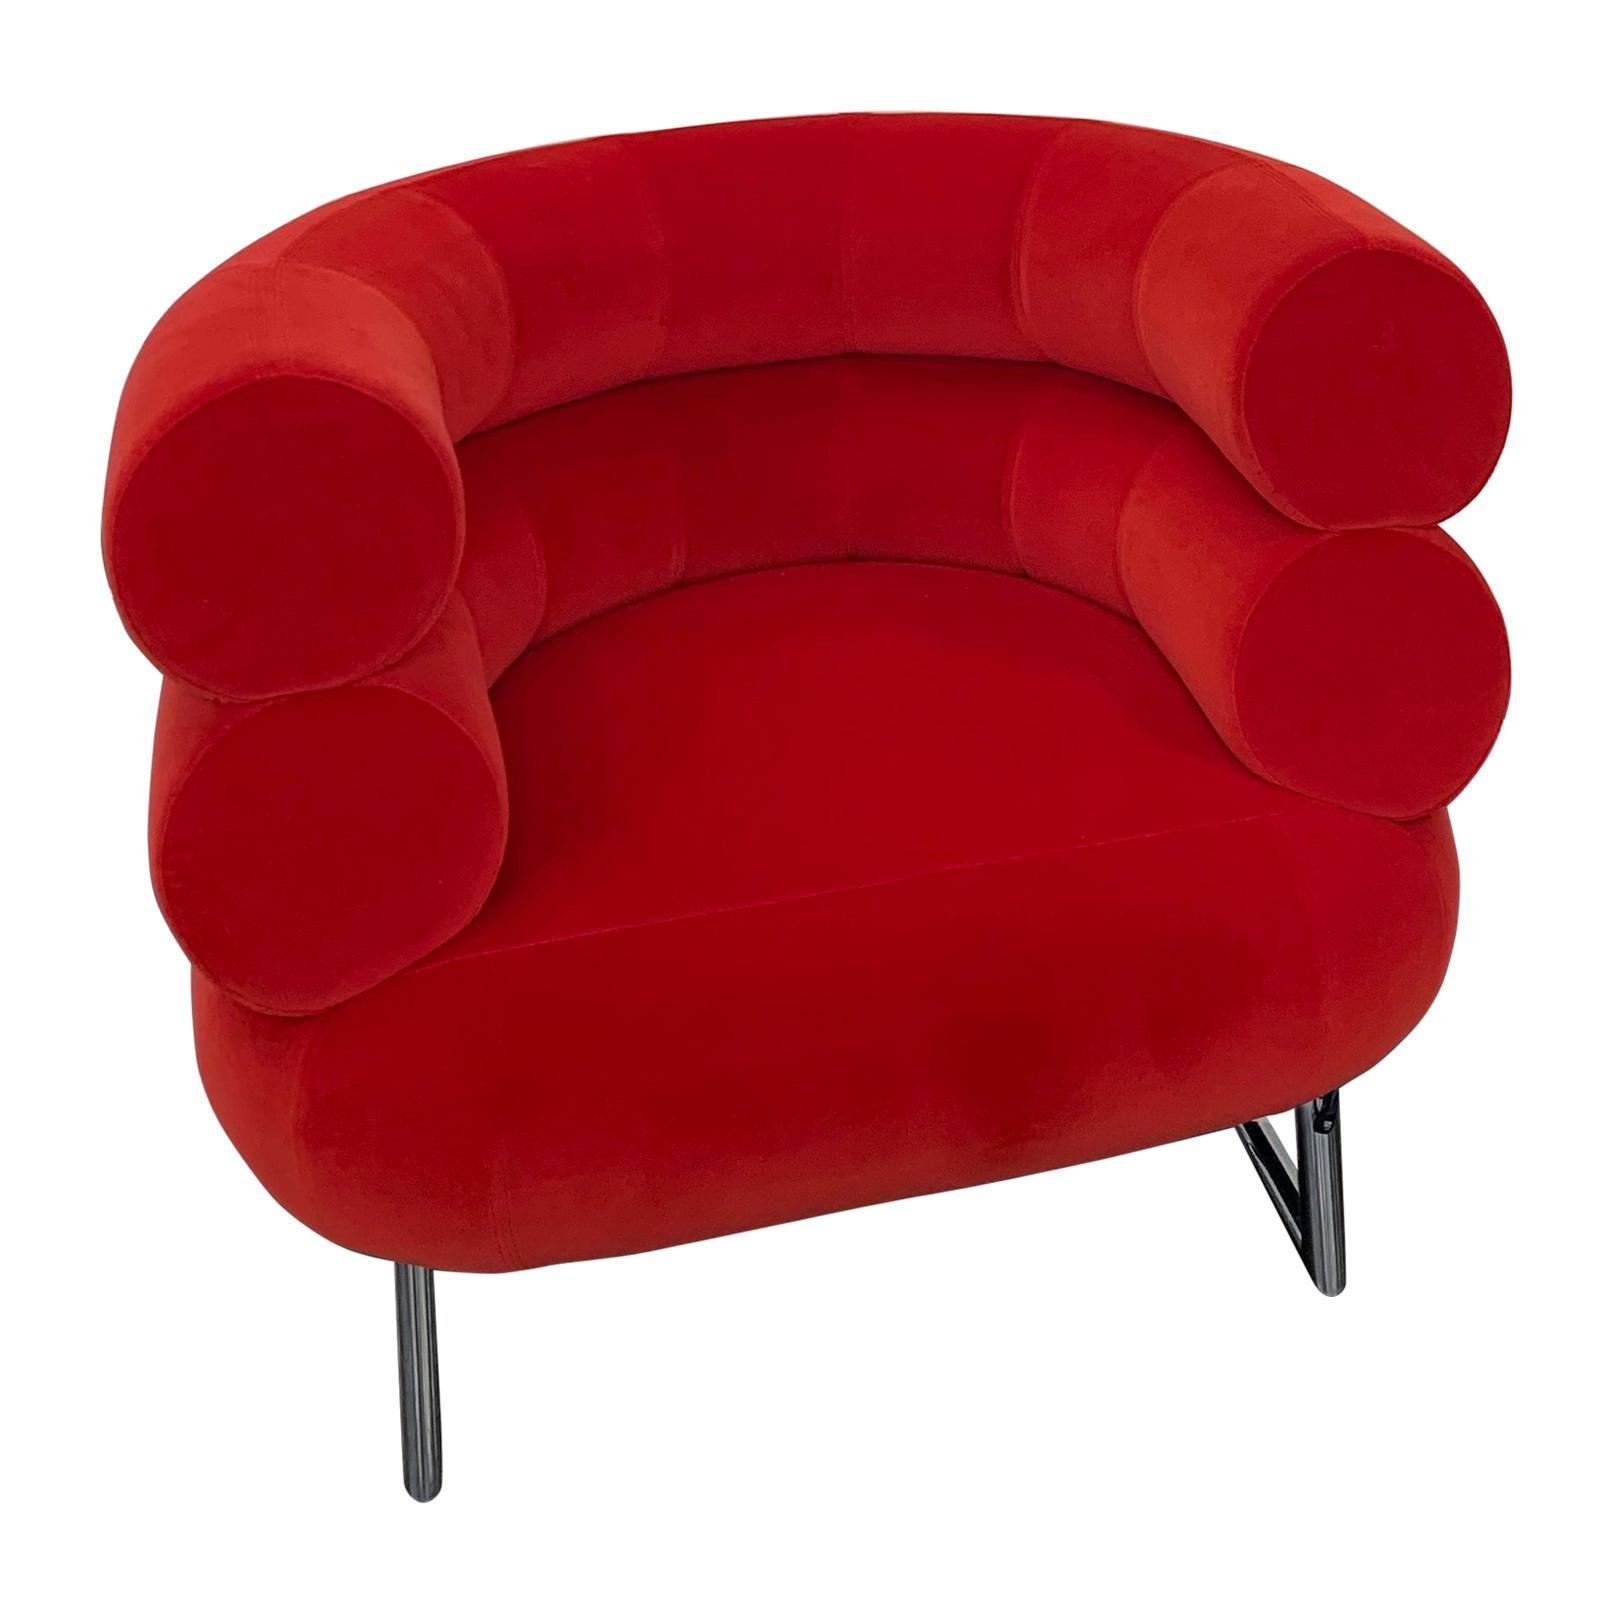 Classicon Red Velvet Bibendum Lounge Chair by Eileen Gray